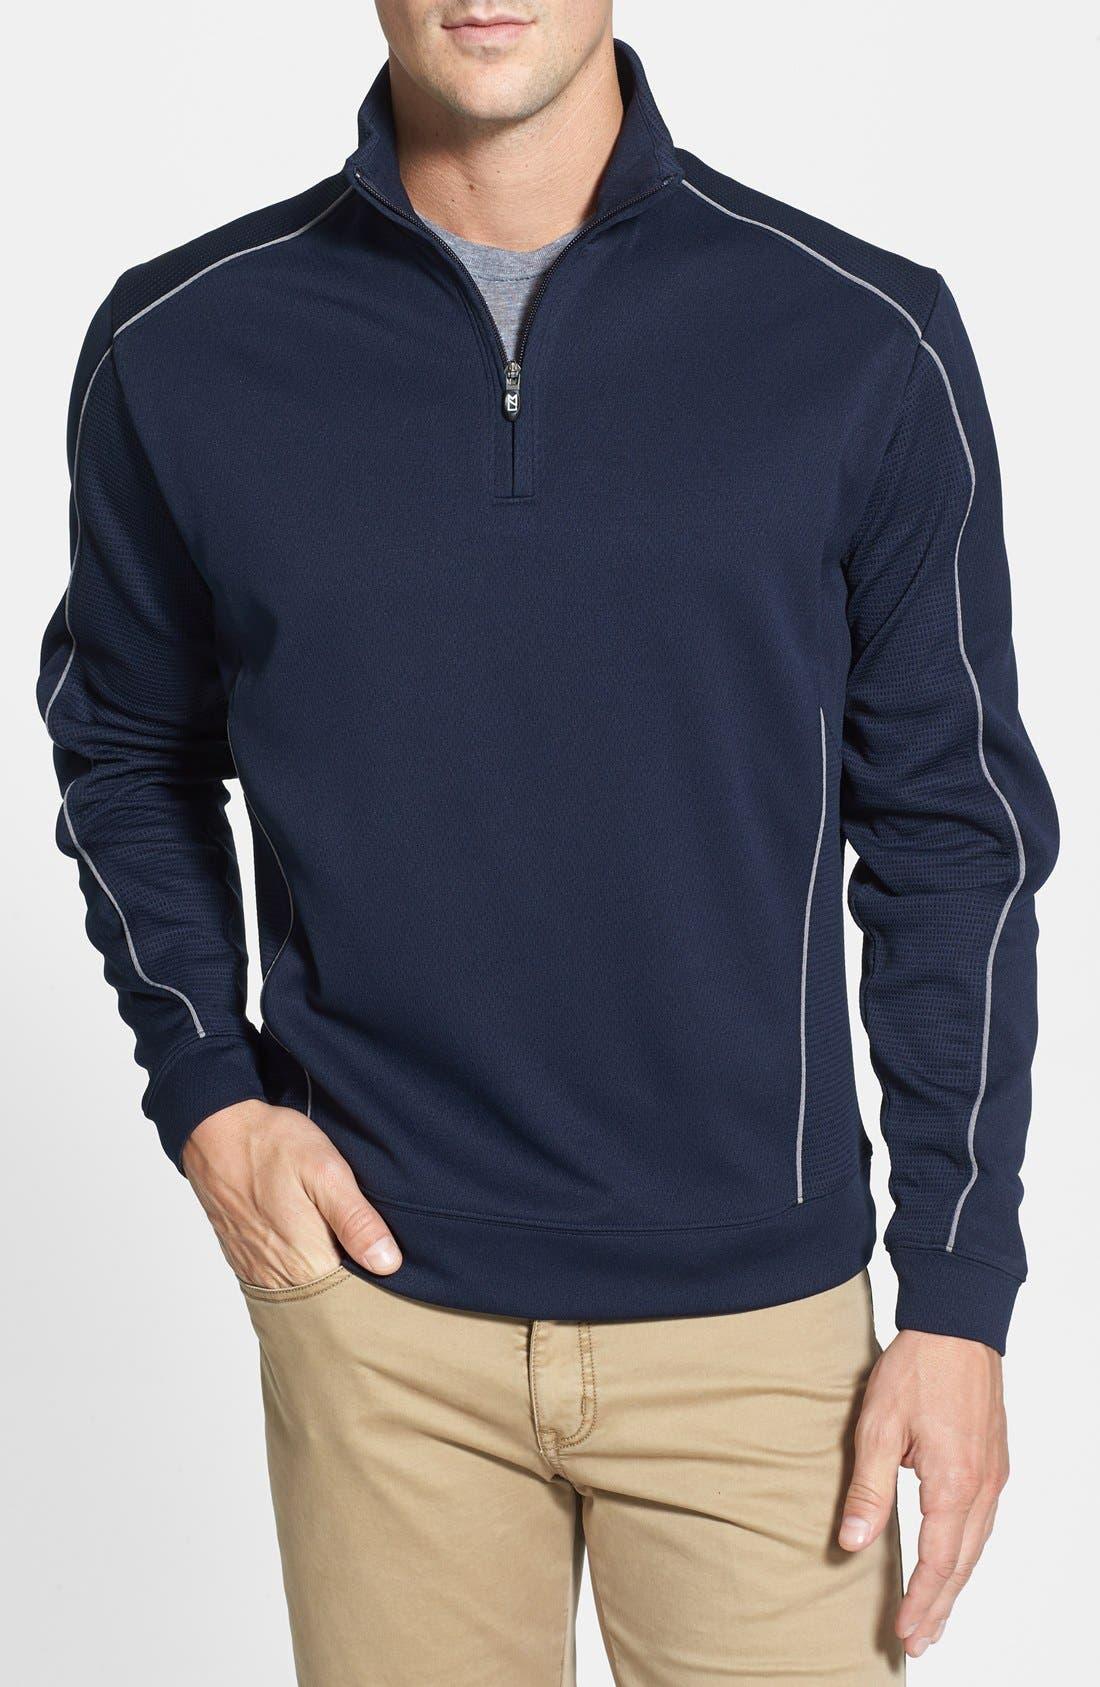 DryTec Half Zip Pullover,                             Main thumbnail 1, color,                             NAVY BLUE